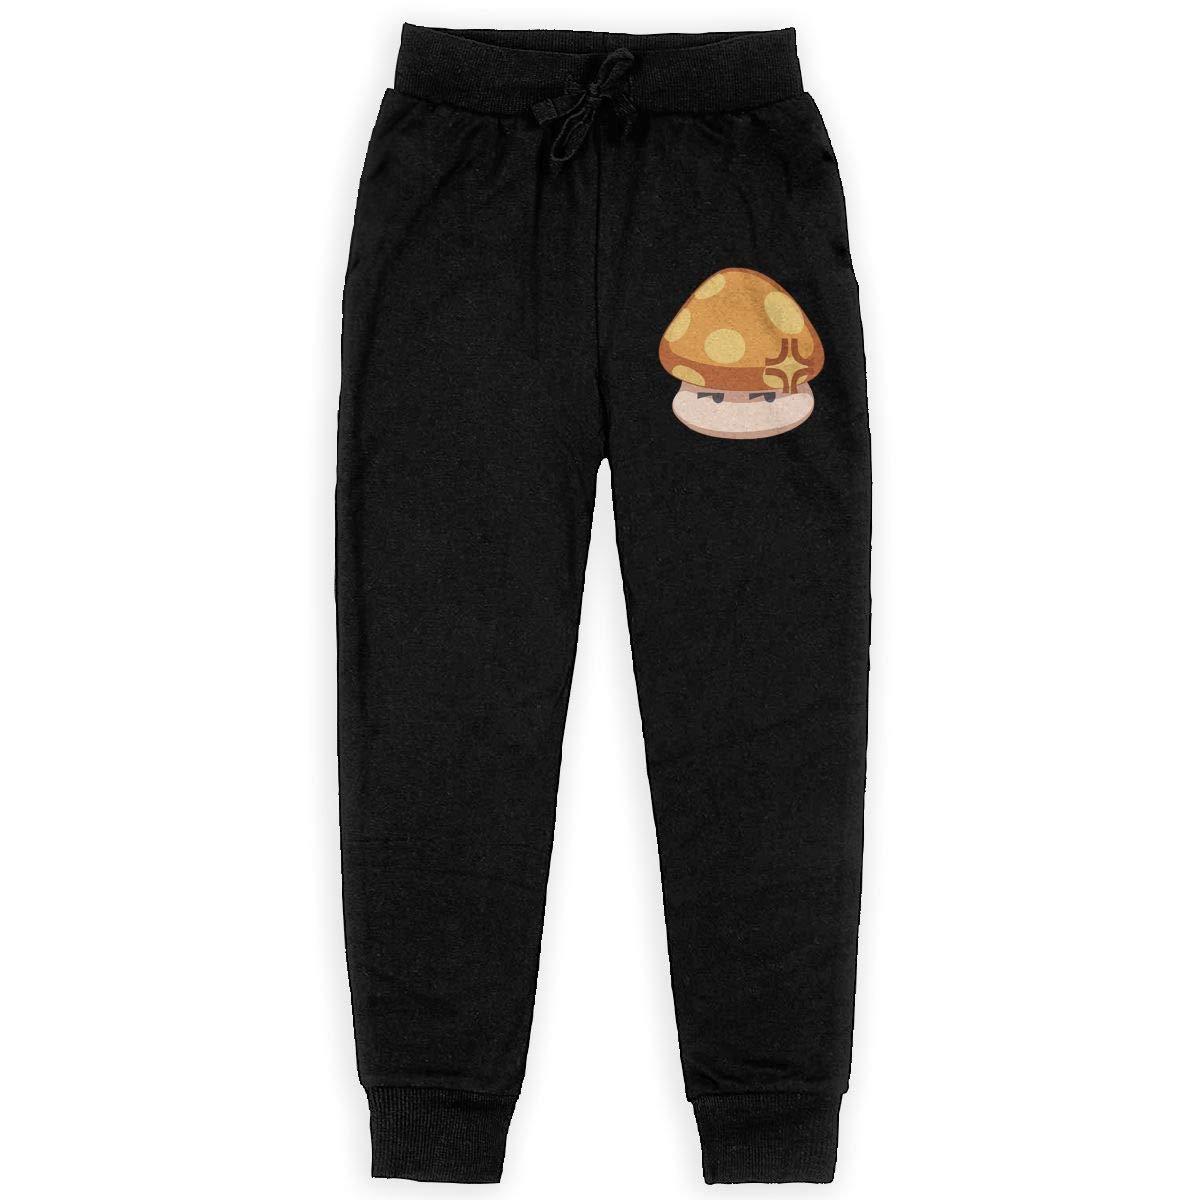 Kim Mittelstaedt Funny Mushroom Boys Big Active Basic Casual Pants Sweatpants for Boys Black